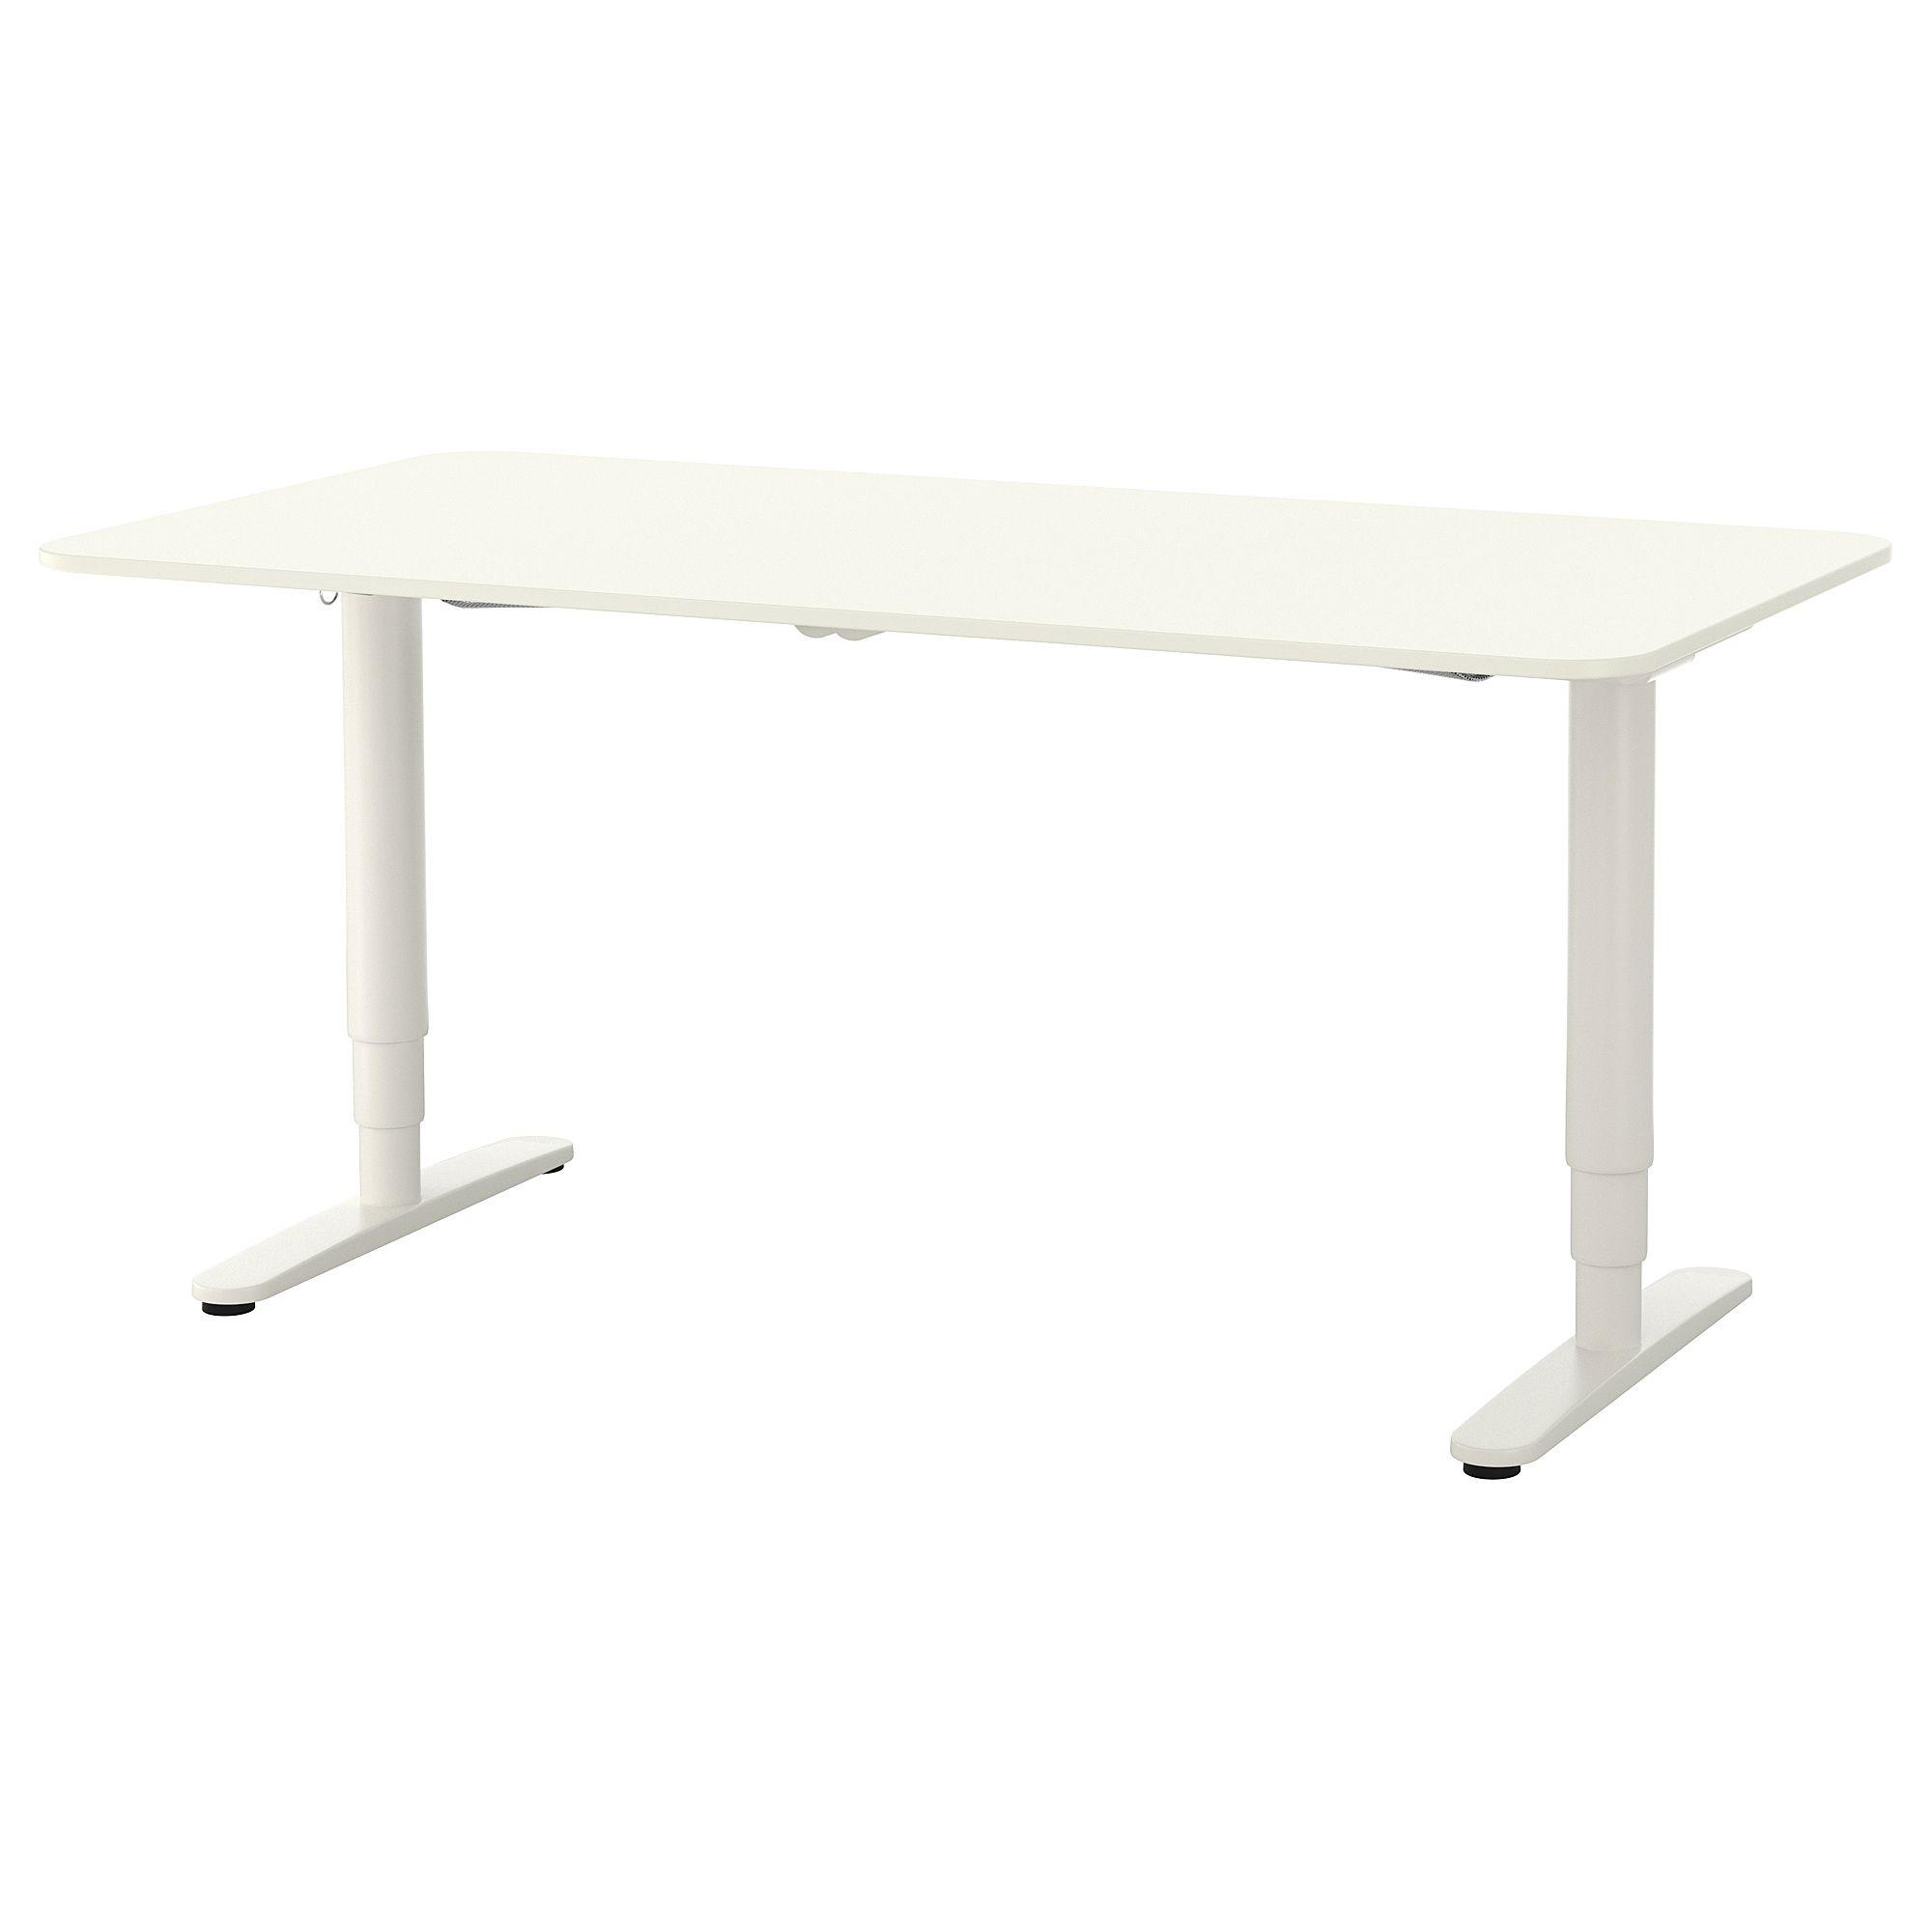 Bekant Desk Sit Stand White In 2019 Office Ikea Bekant Desk Ikea Desk Sit Stand Desk